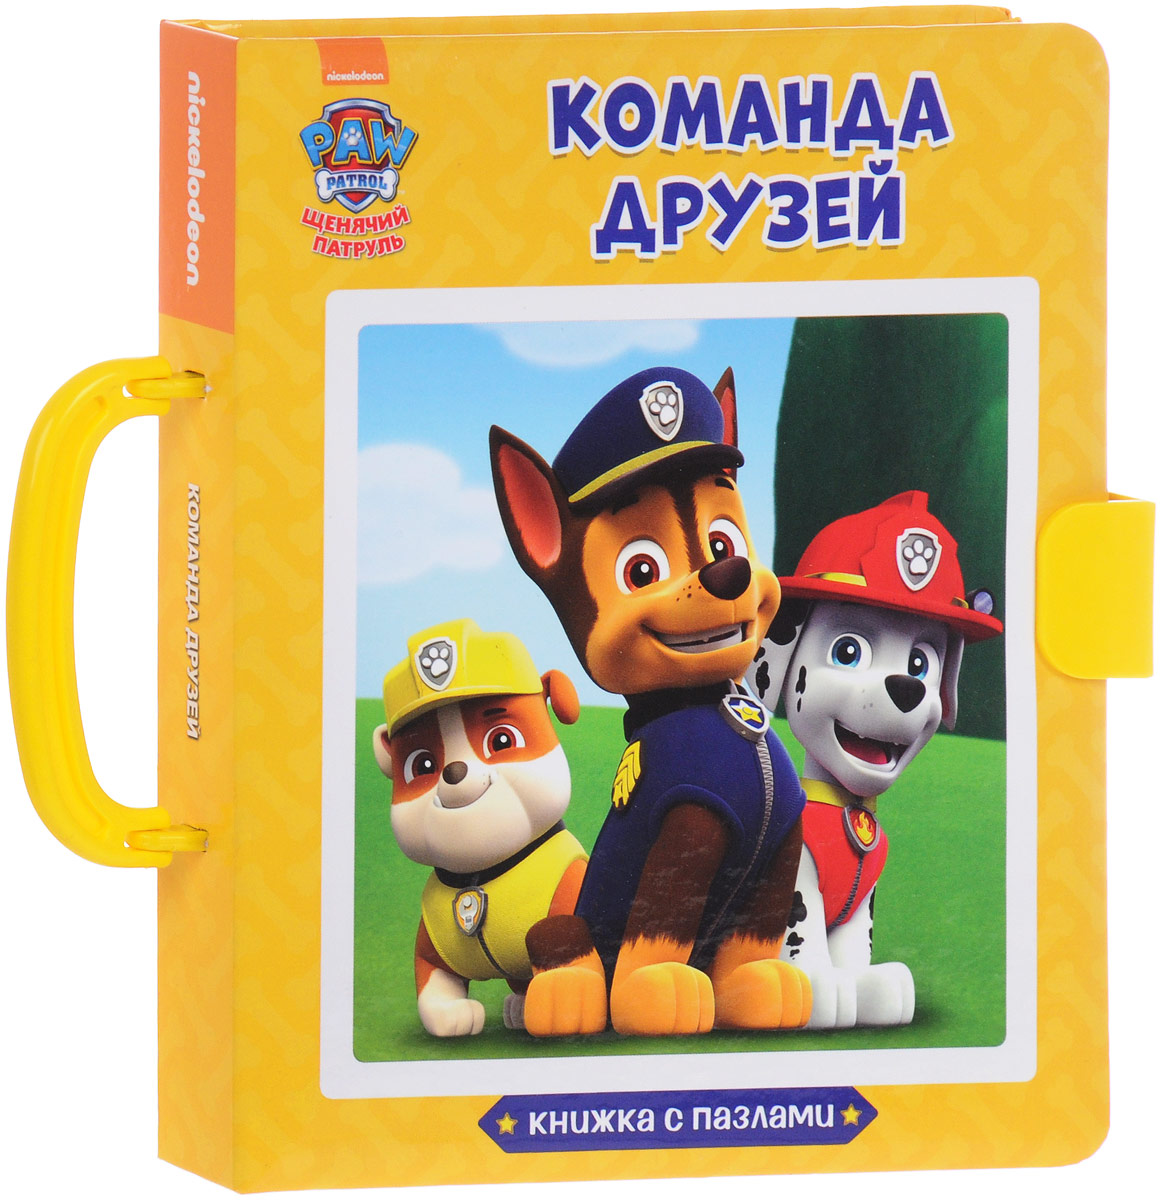 А. М. Купырина Команда друзей. Книжка-игрушка